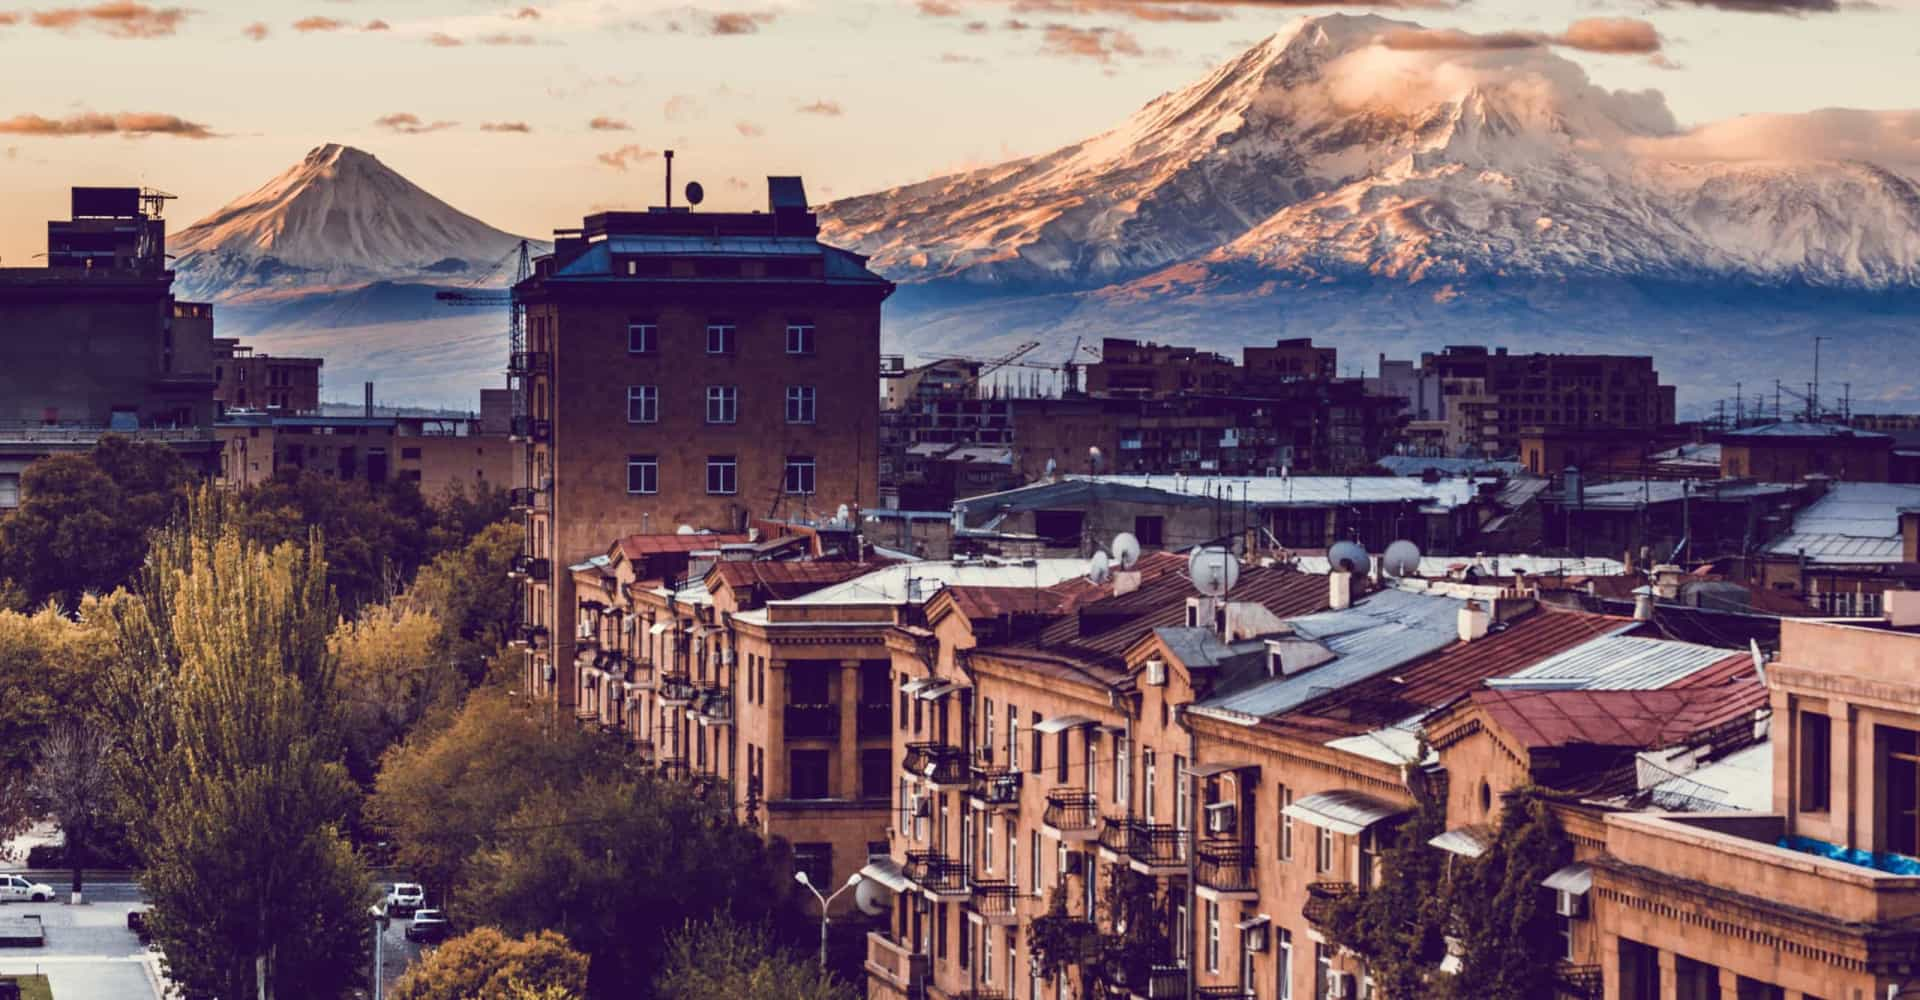 Armenia: Why this under-explored destination belongs on your bucket list